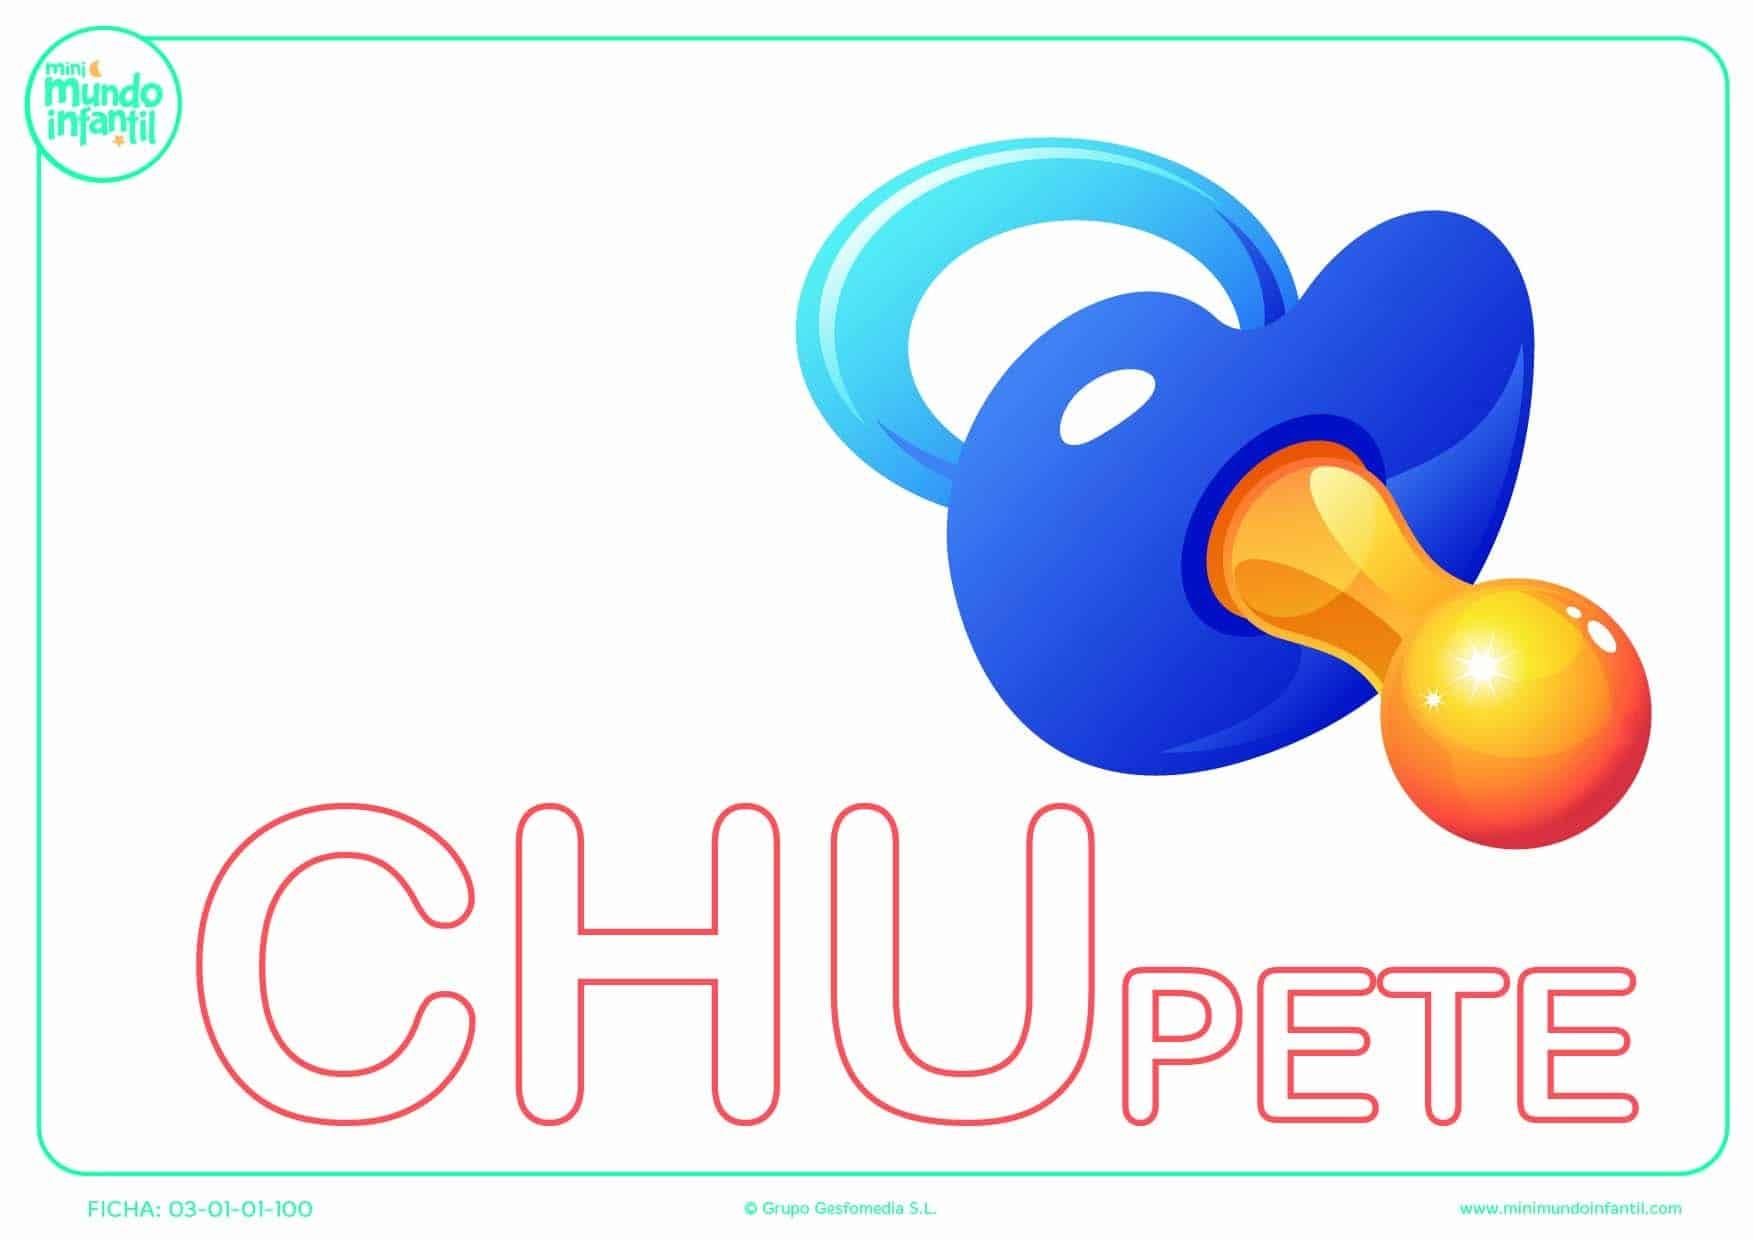 Poner color a la sílaba CHU mayúscula de chupete